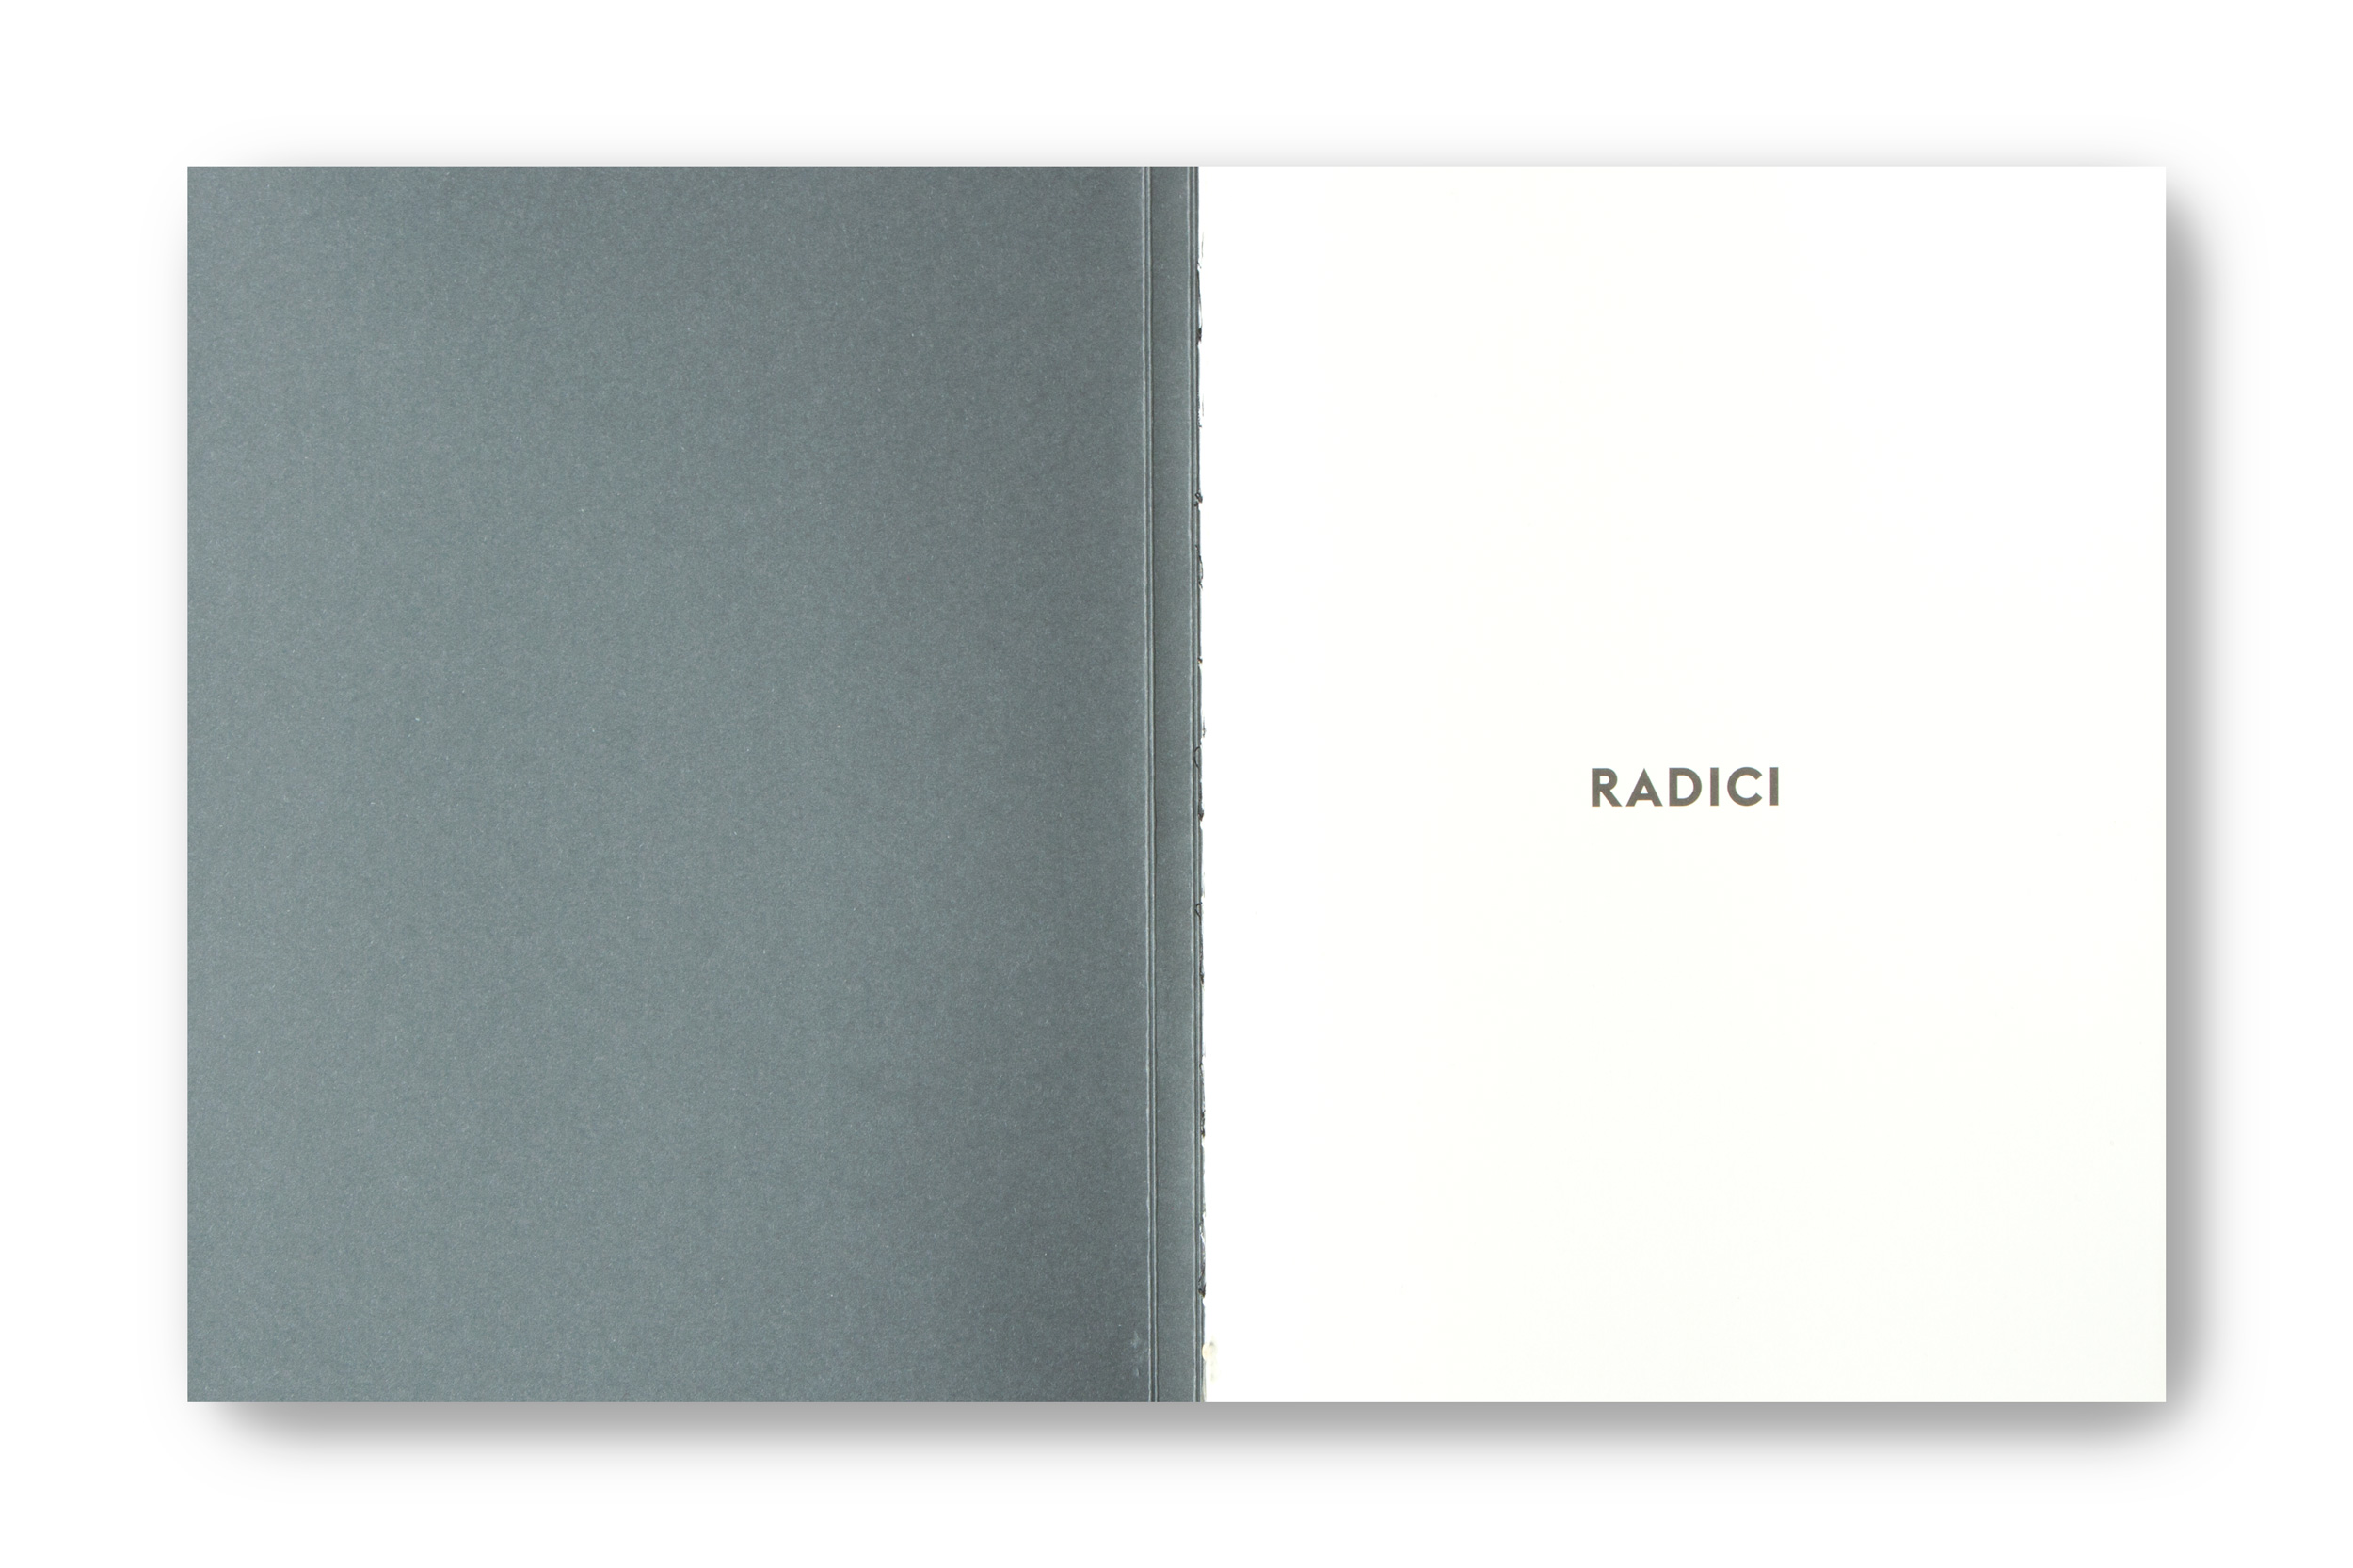 radici_02.jpg